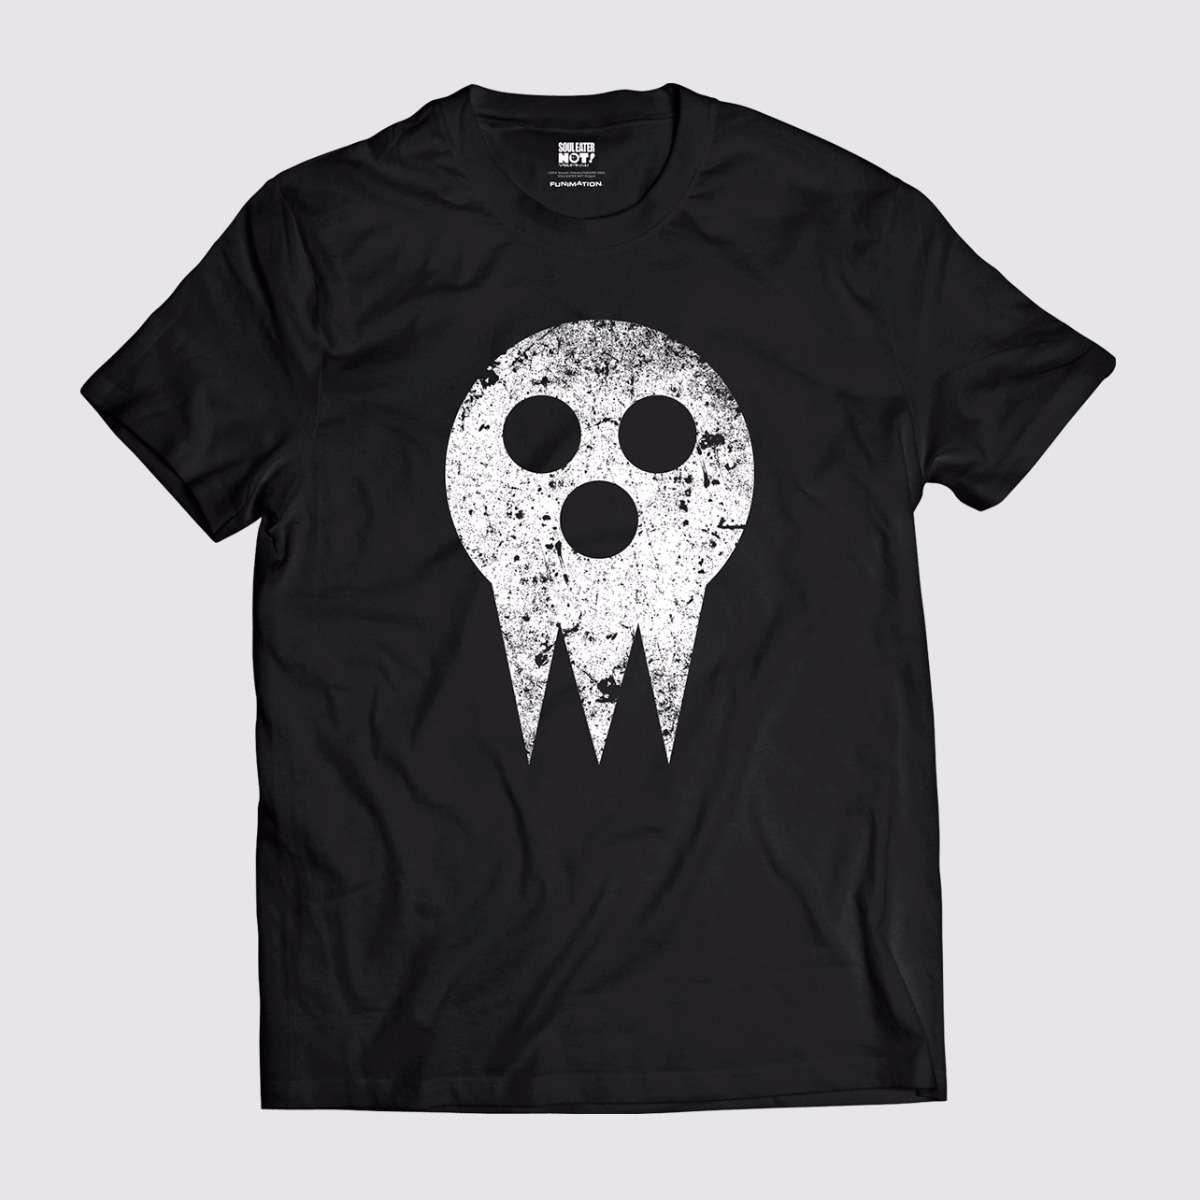 T-shirt Black apparel